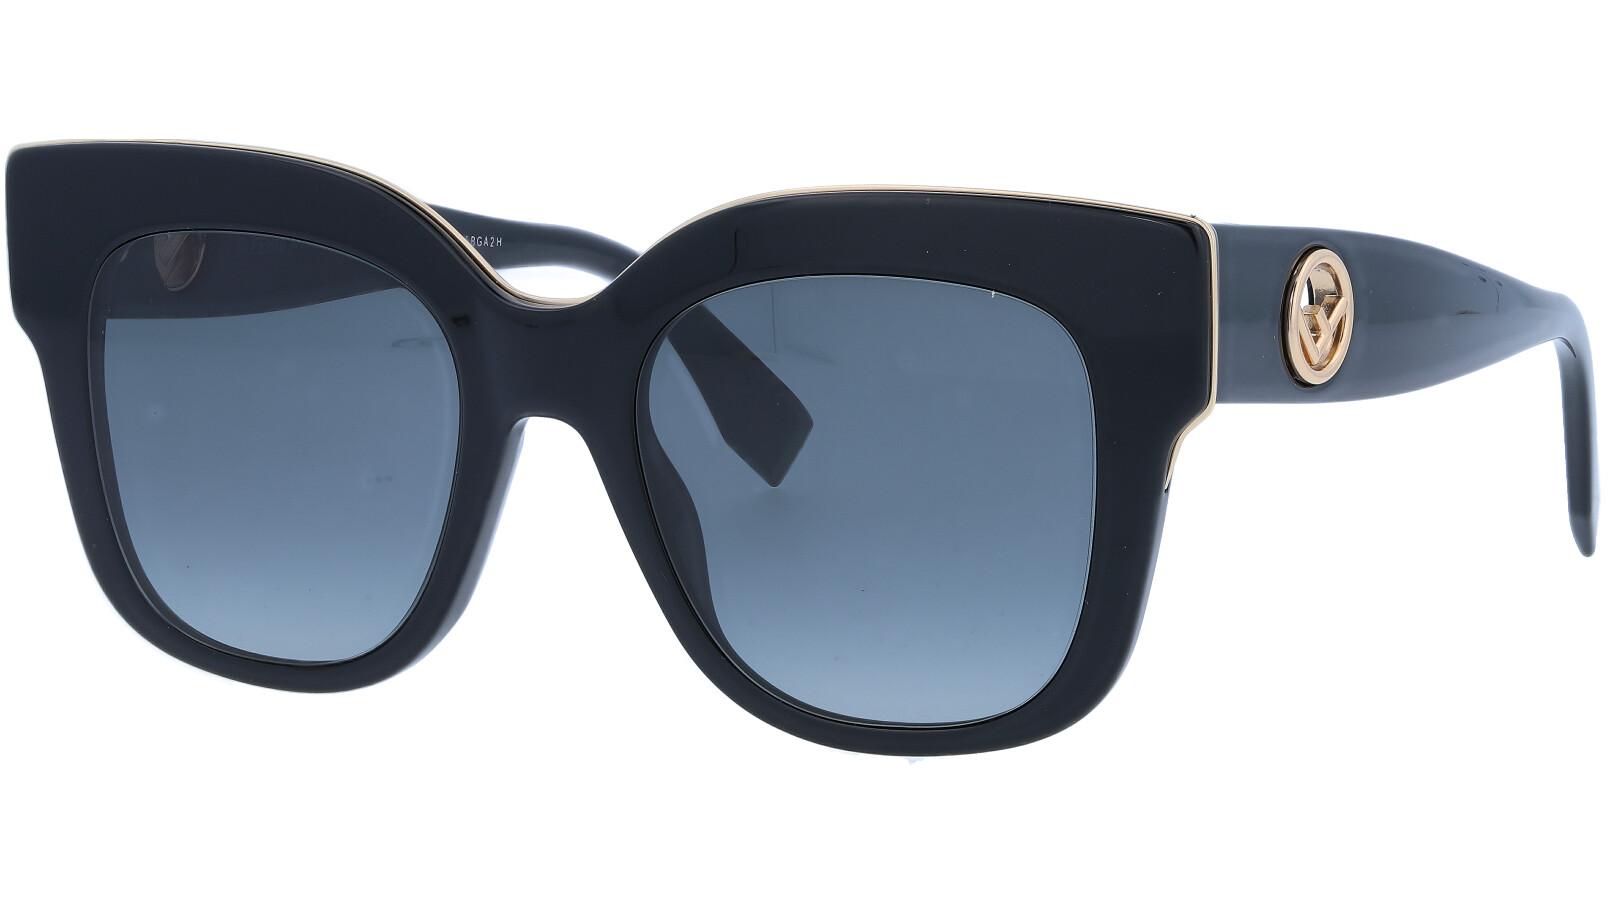 FENDI FF0359/G/S 80790 51 Black Square Sunglasses